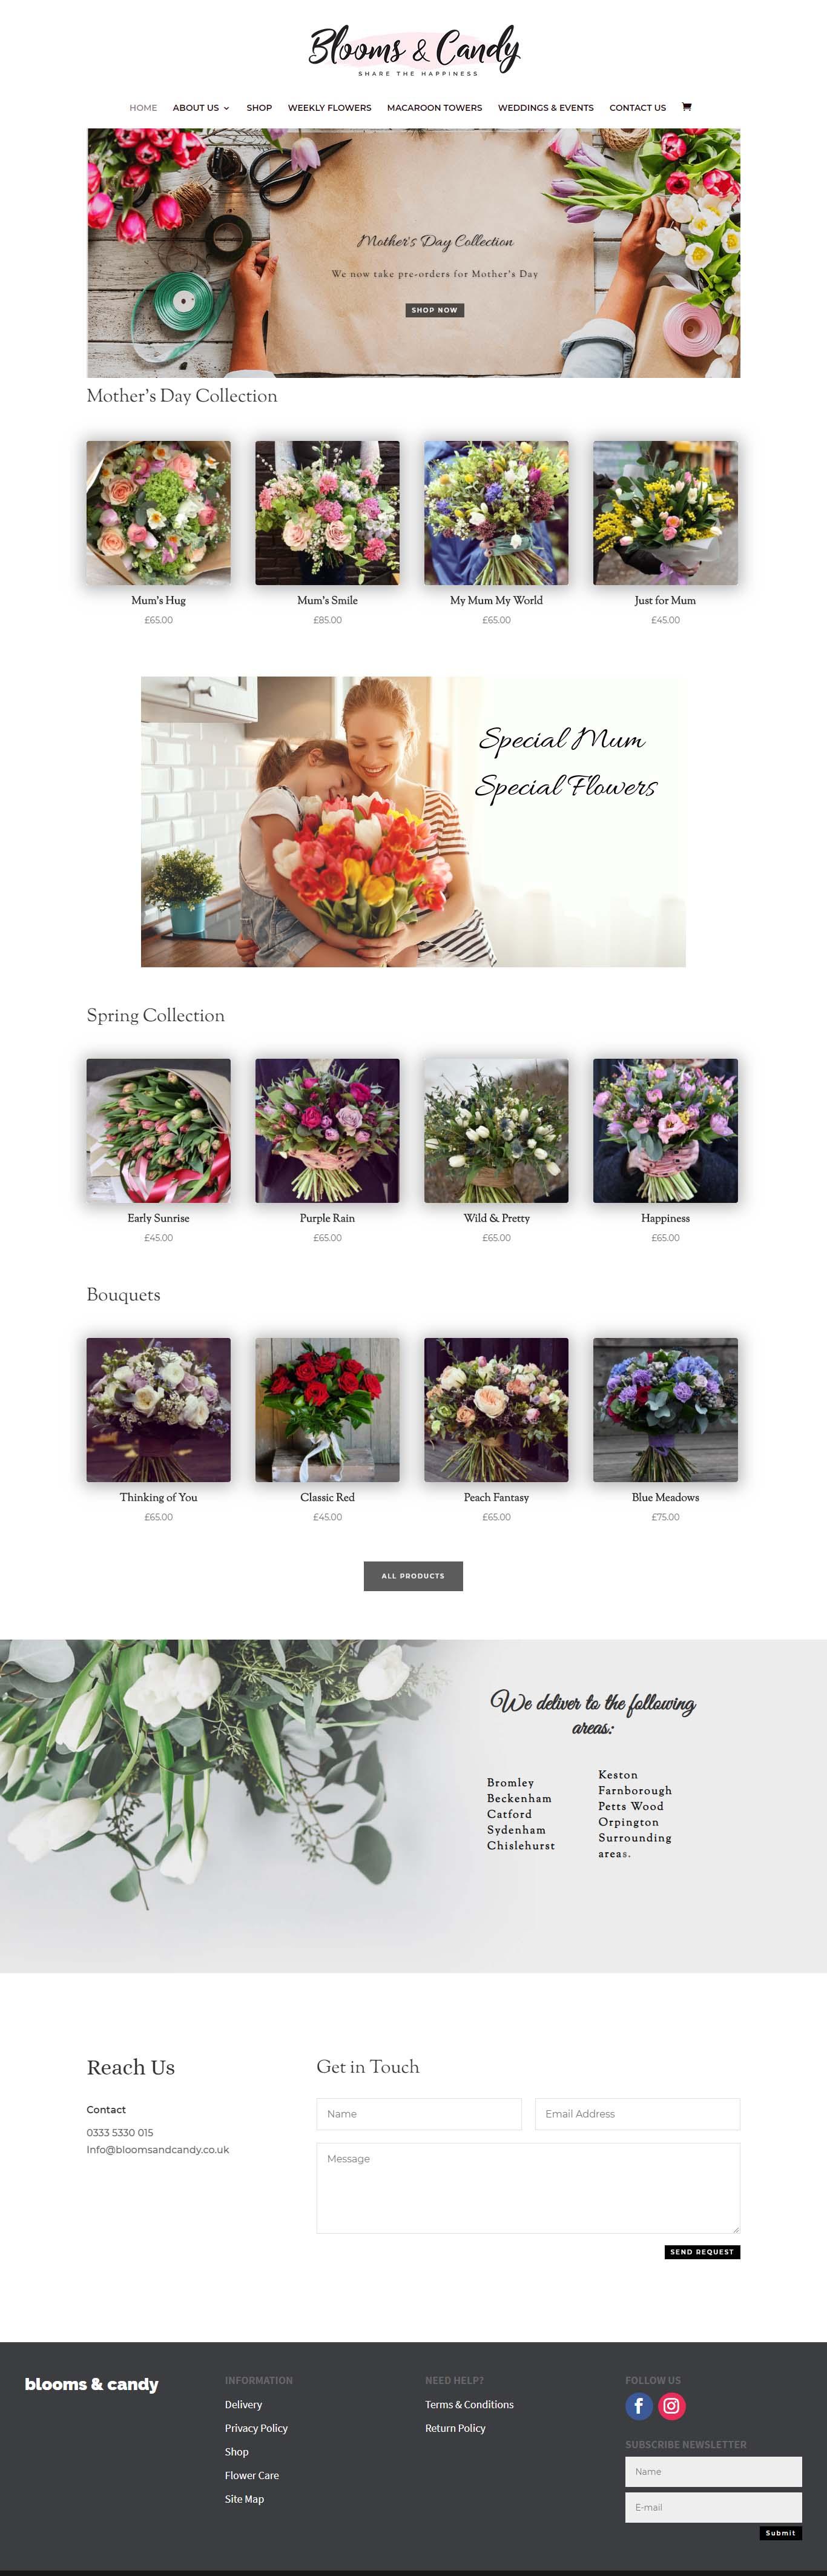 screencapture-bloomsandcandy-co-uk-2019-03-14-21_32_53